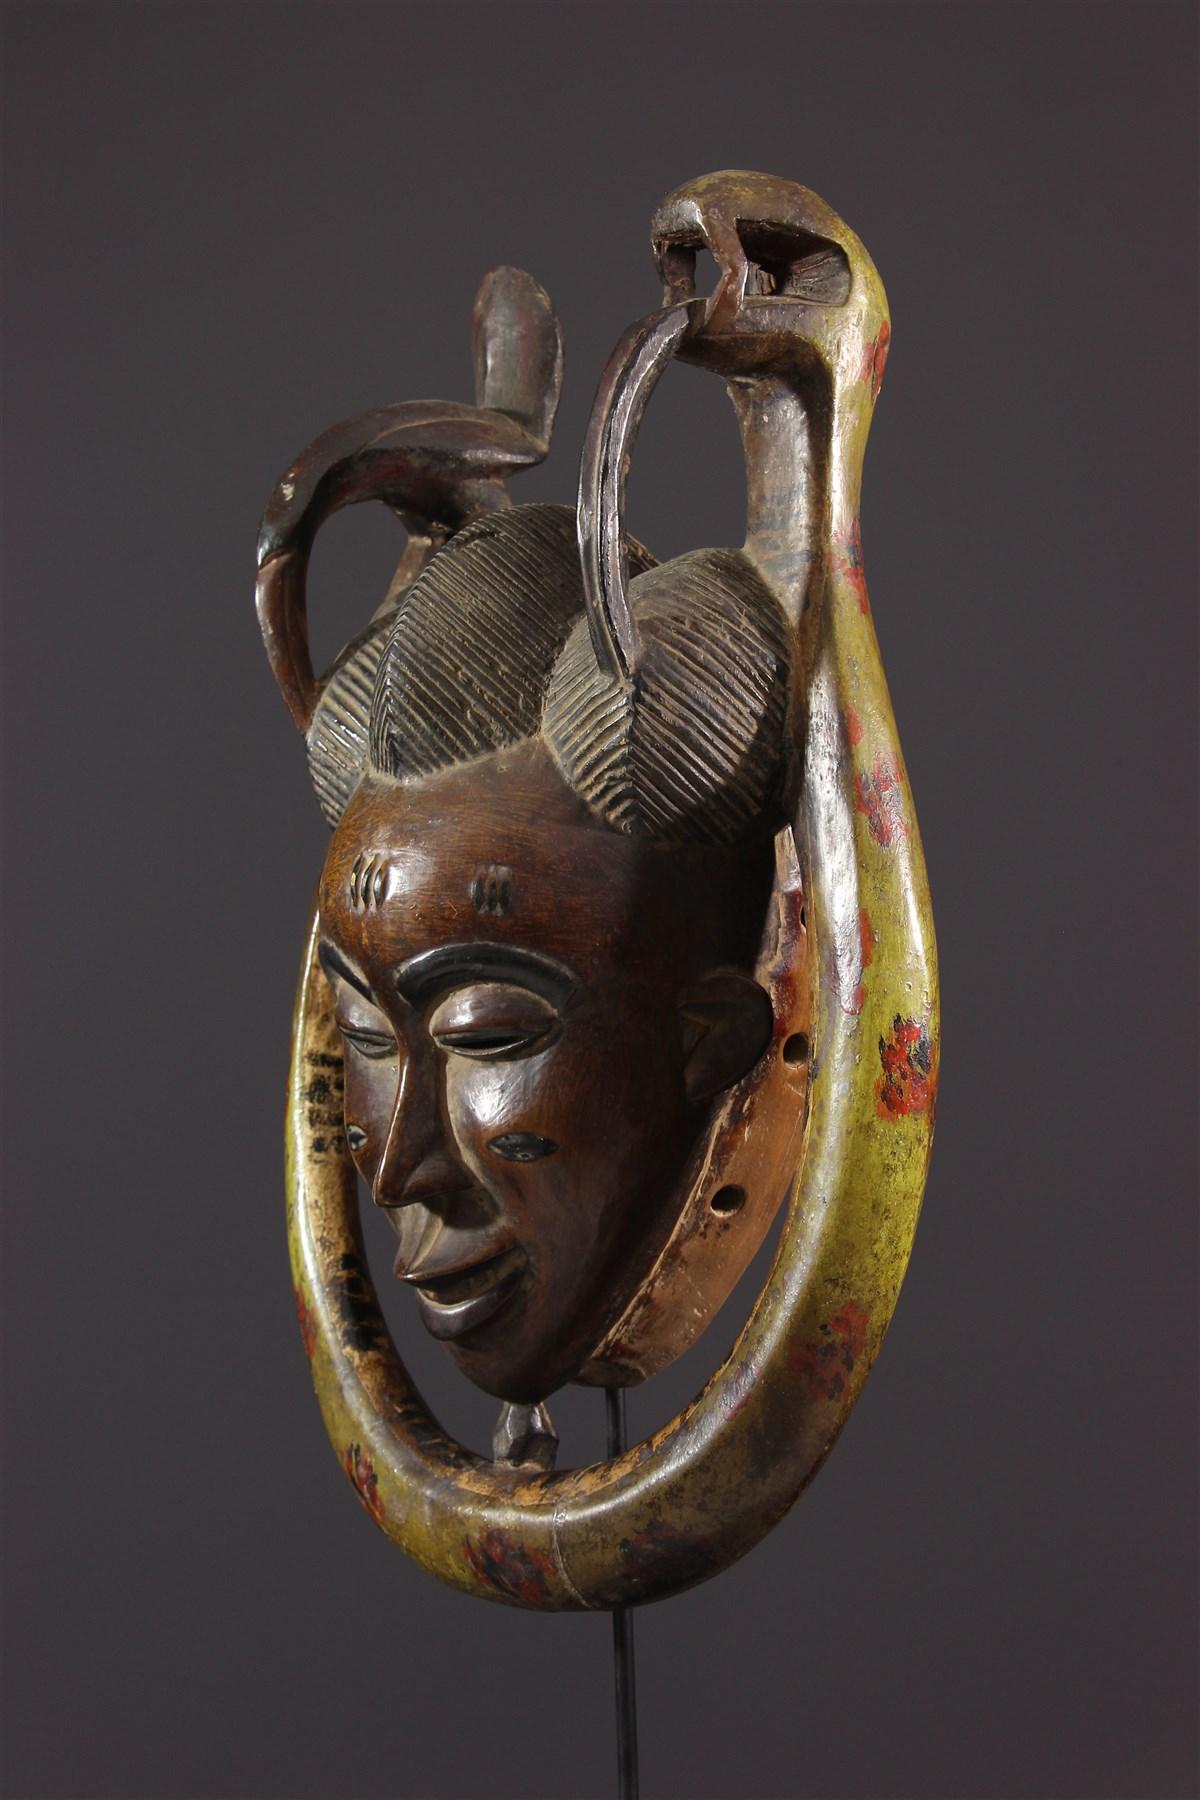 Masque Gouro Gu de la danse Zaouli - art africain